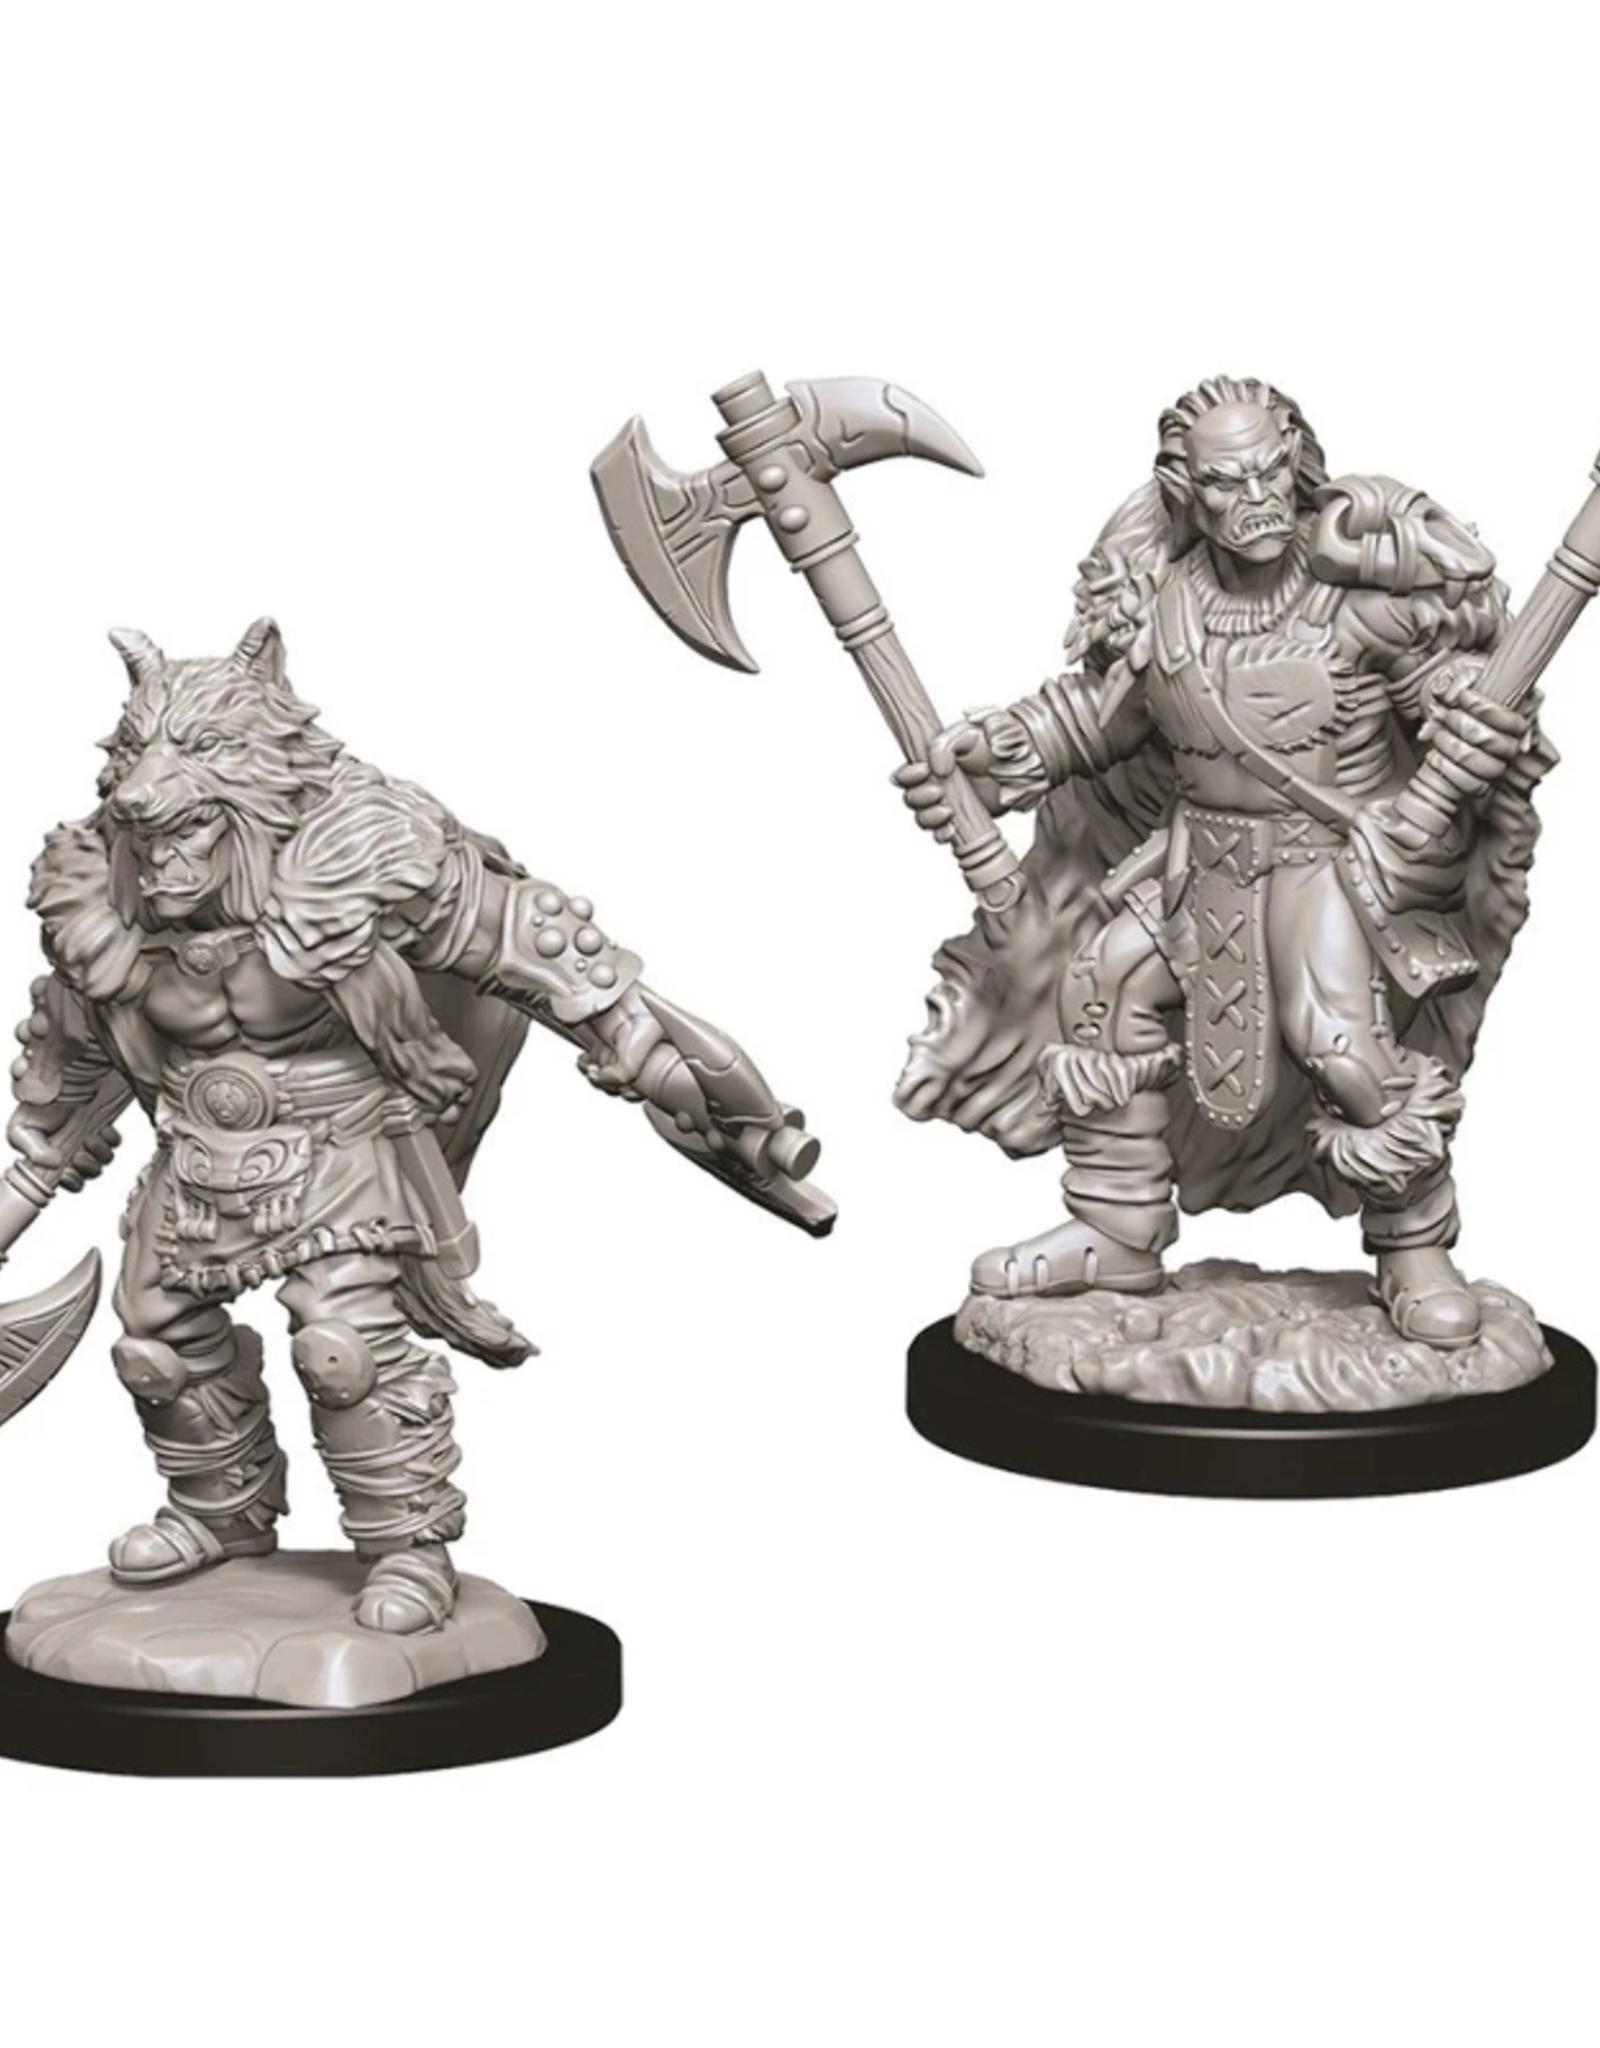 WizKids Dungeons & Dragons Nolzur's Marvelous Miniatures: Male Half-Orc Barbarian